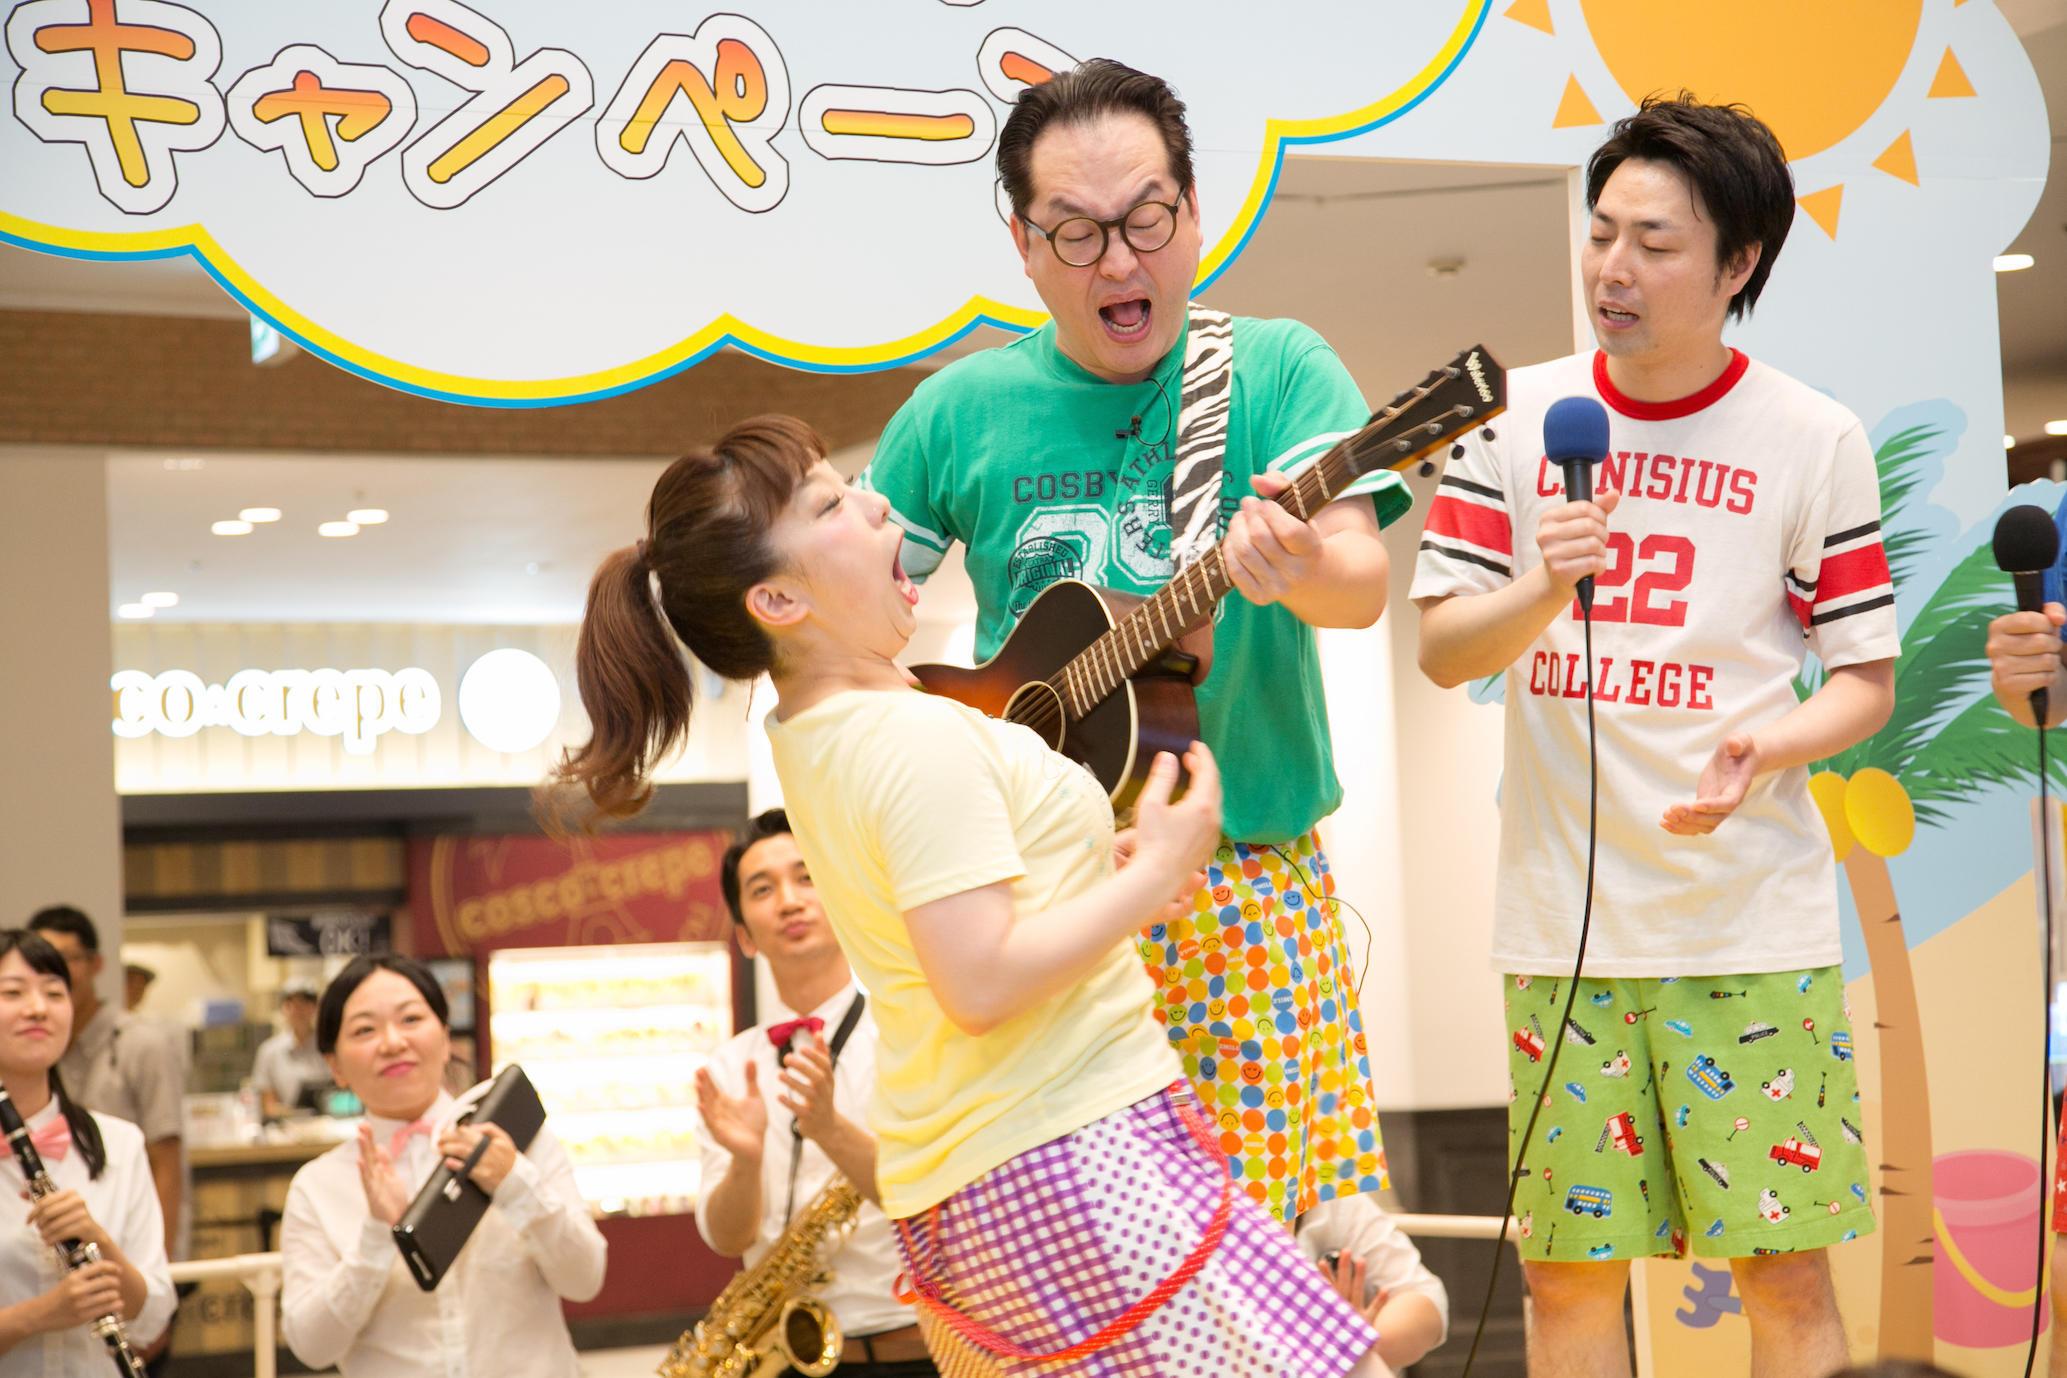 http://news.yoshimoto.co.jp/20180717223307-08d6eb02da95861ce67667224fd8f479c7e96454.jpg